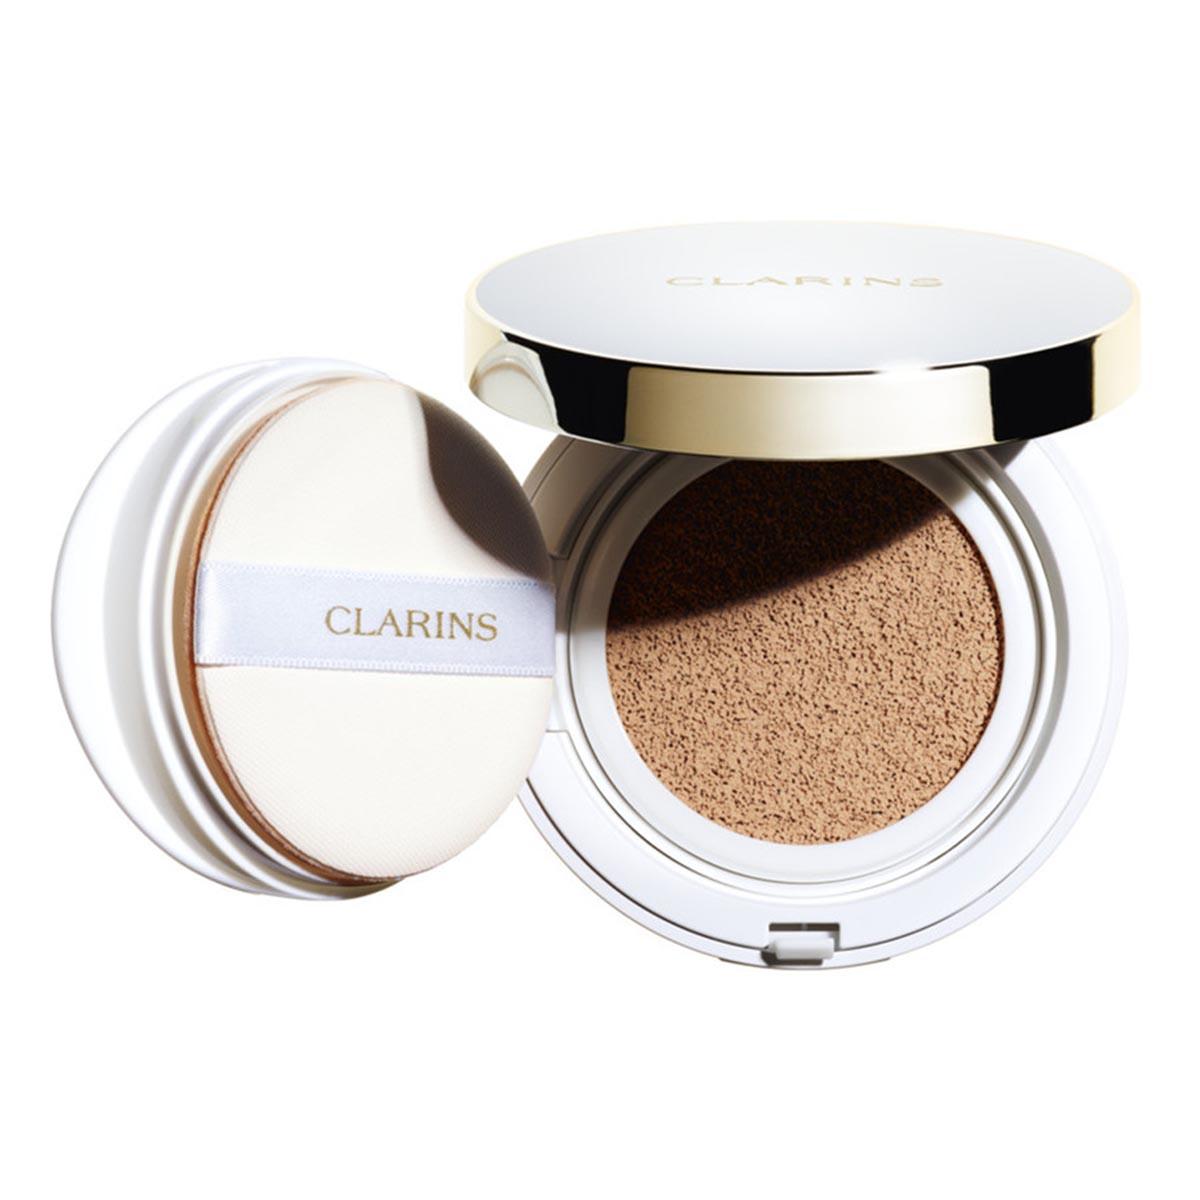 Clarins everlasting cushion base 107 beige